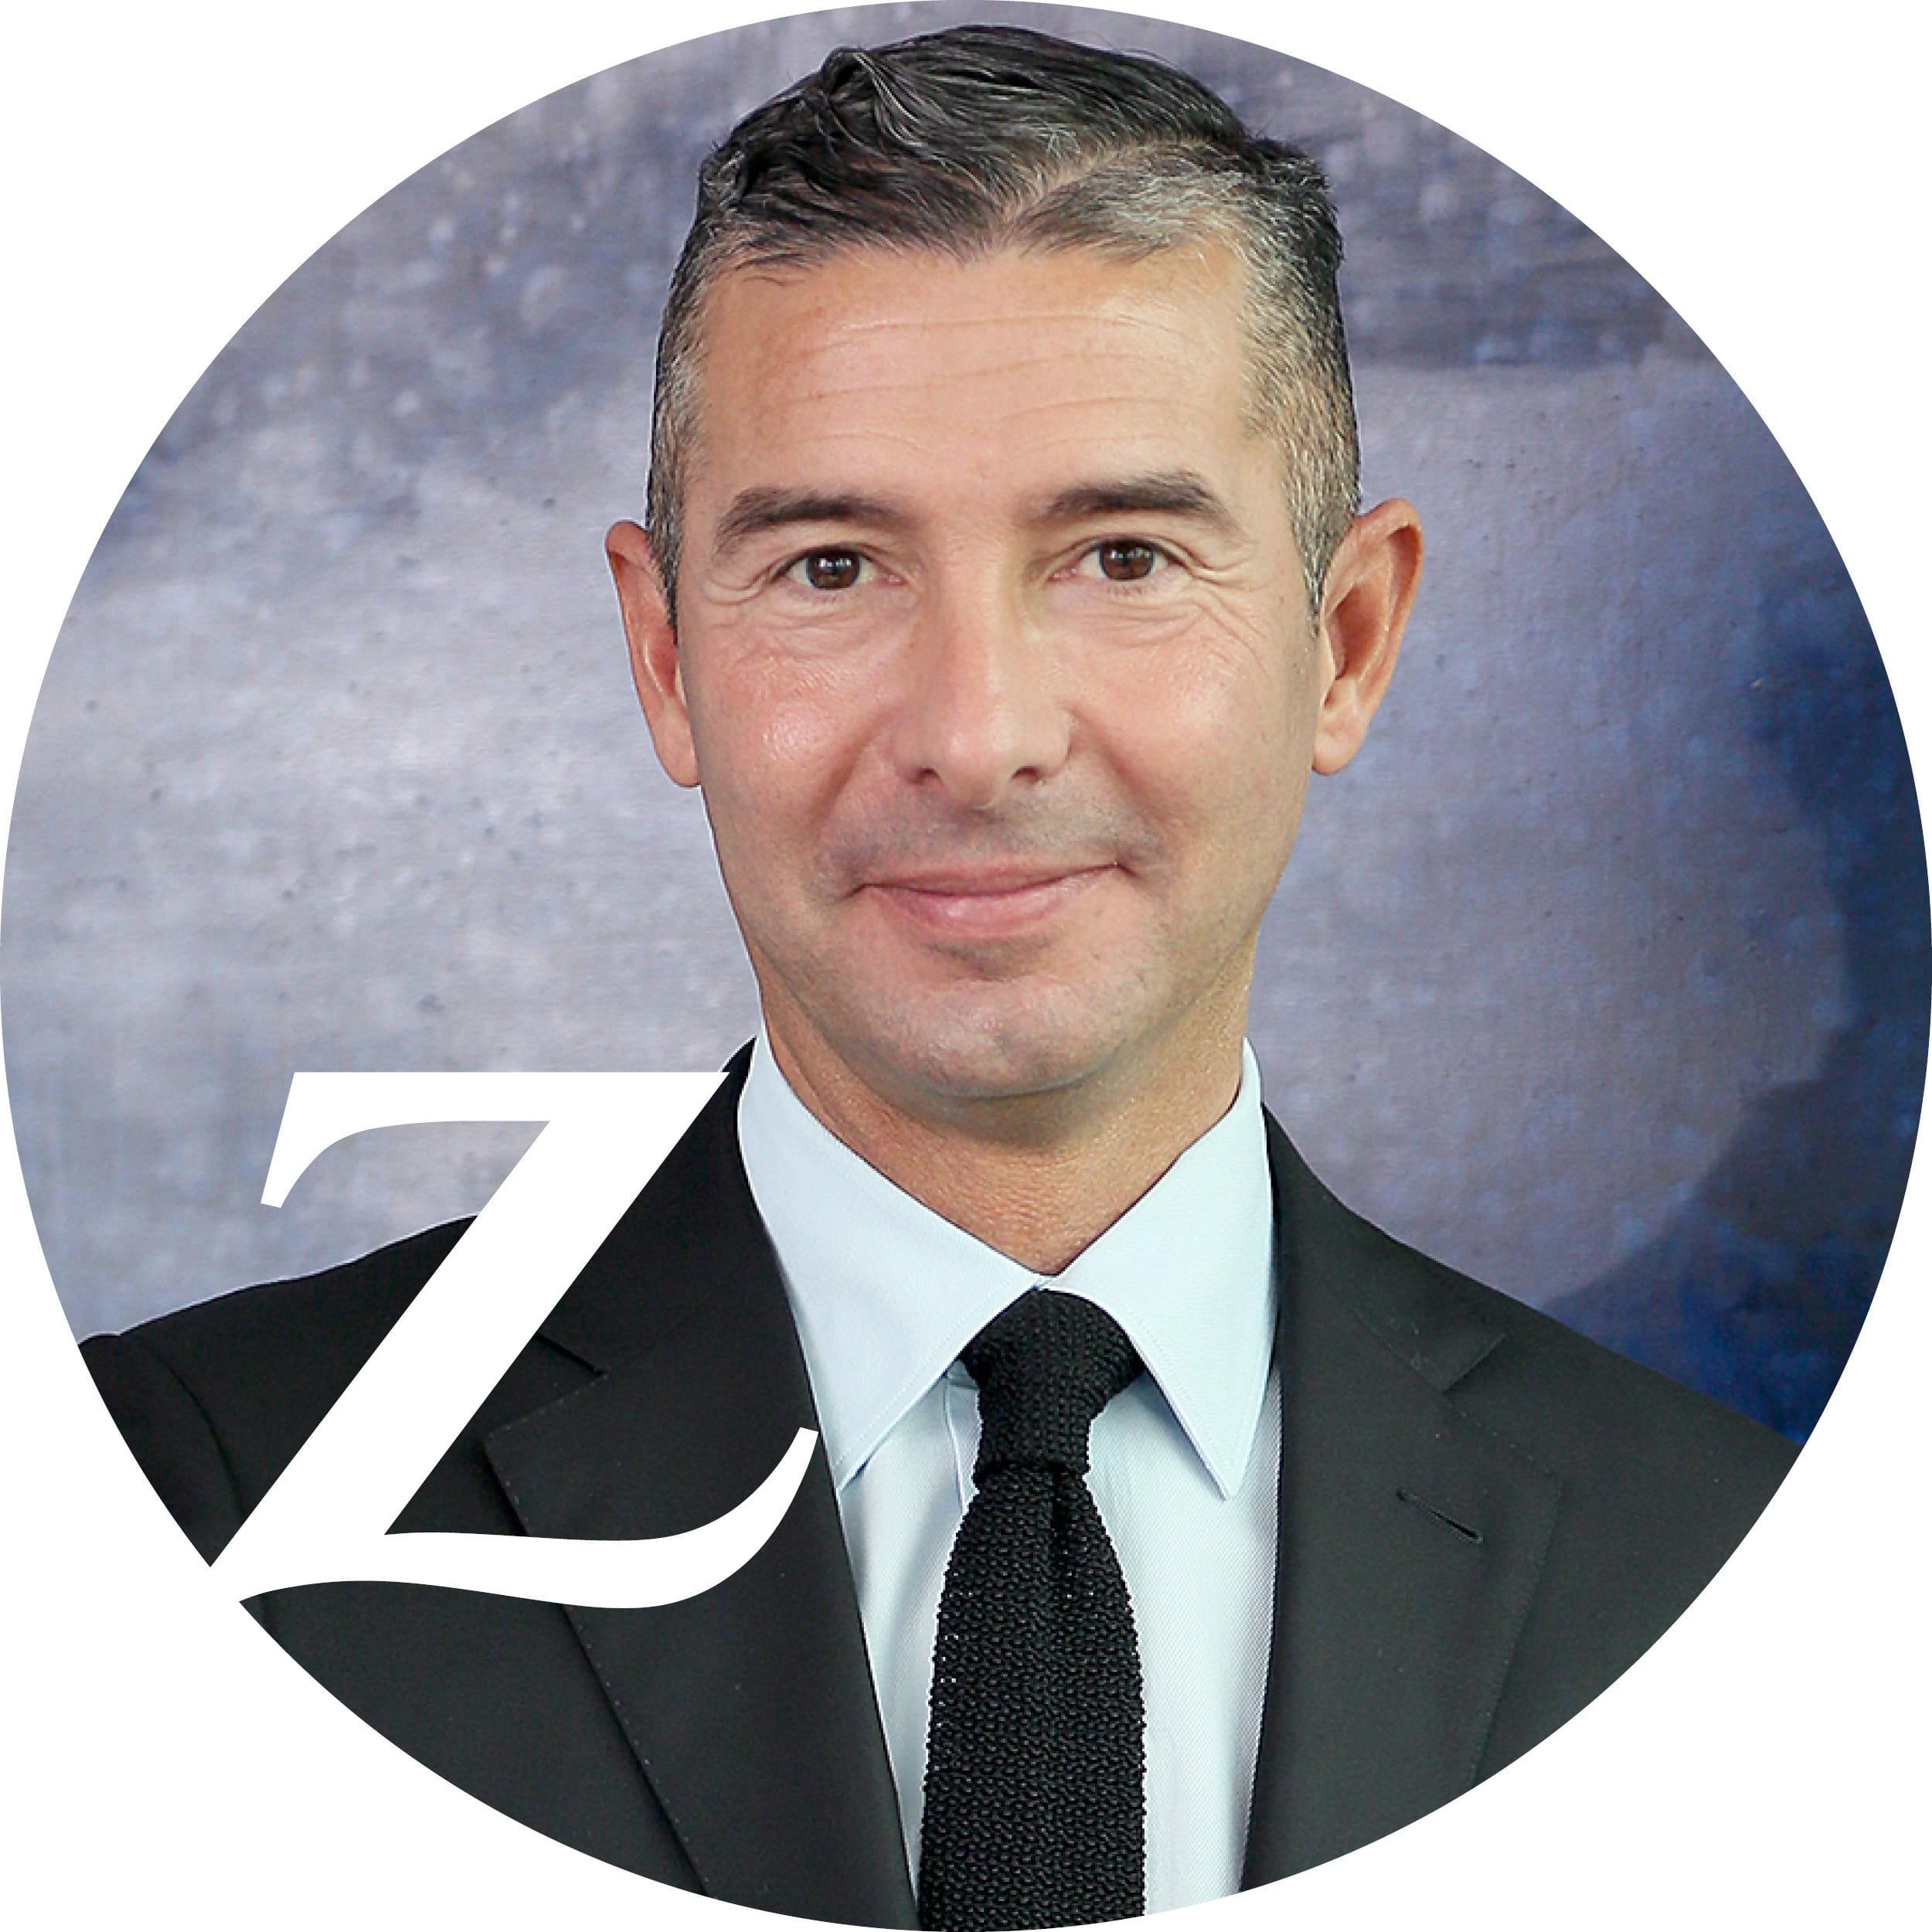 Juan Beer, Chief Executive Officer Zurich Schweiz